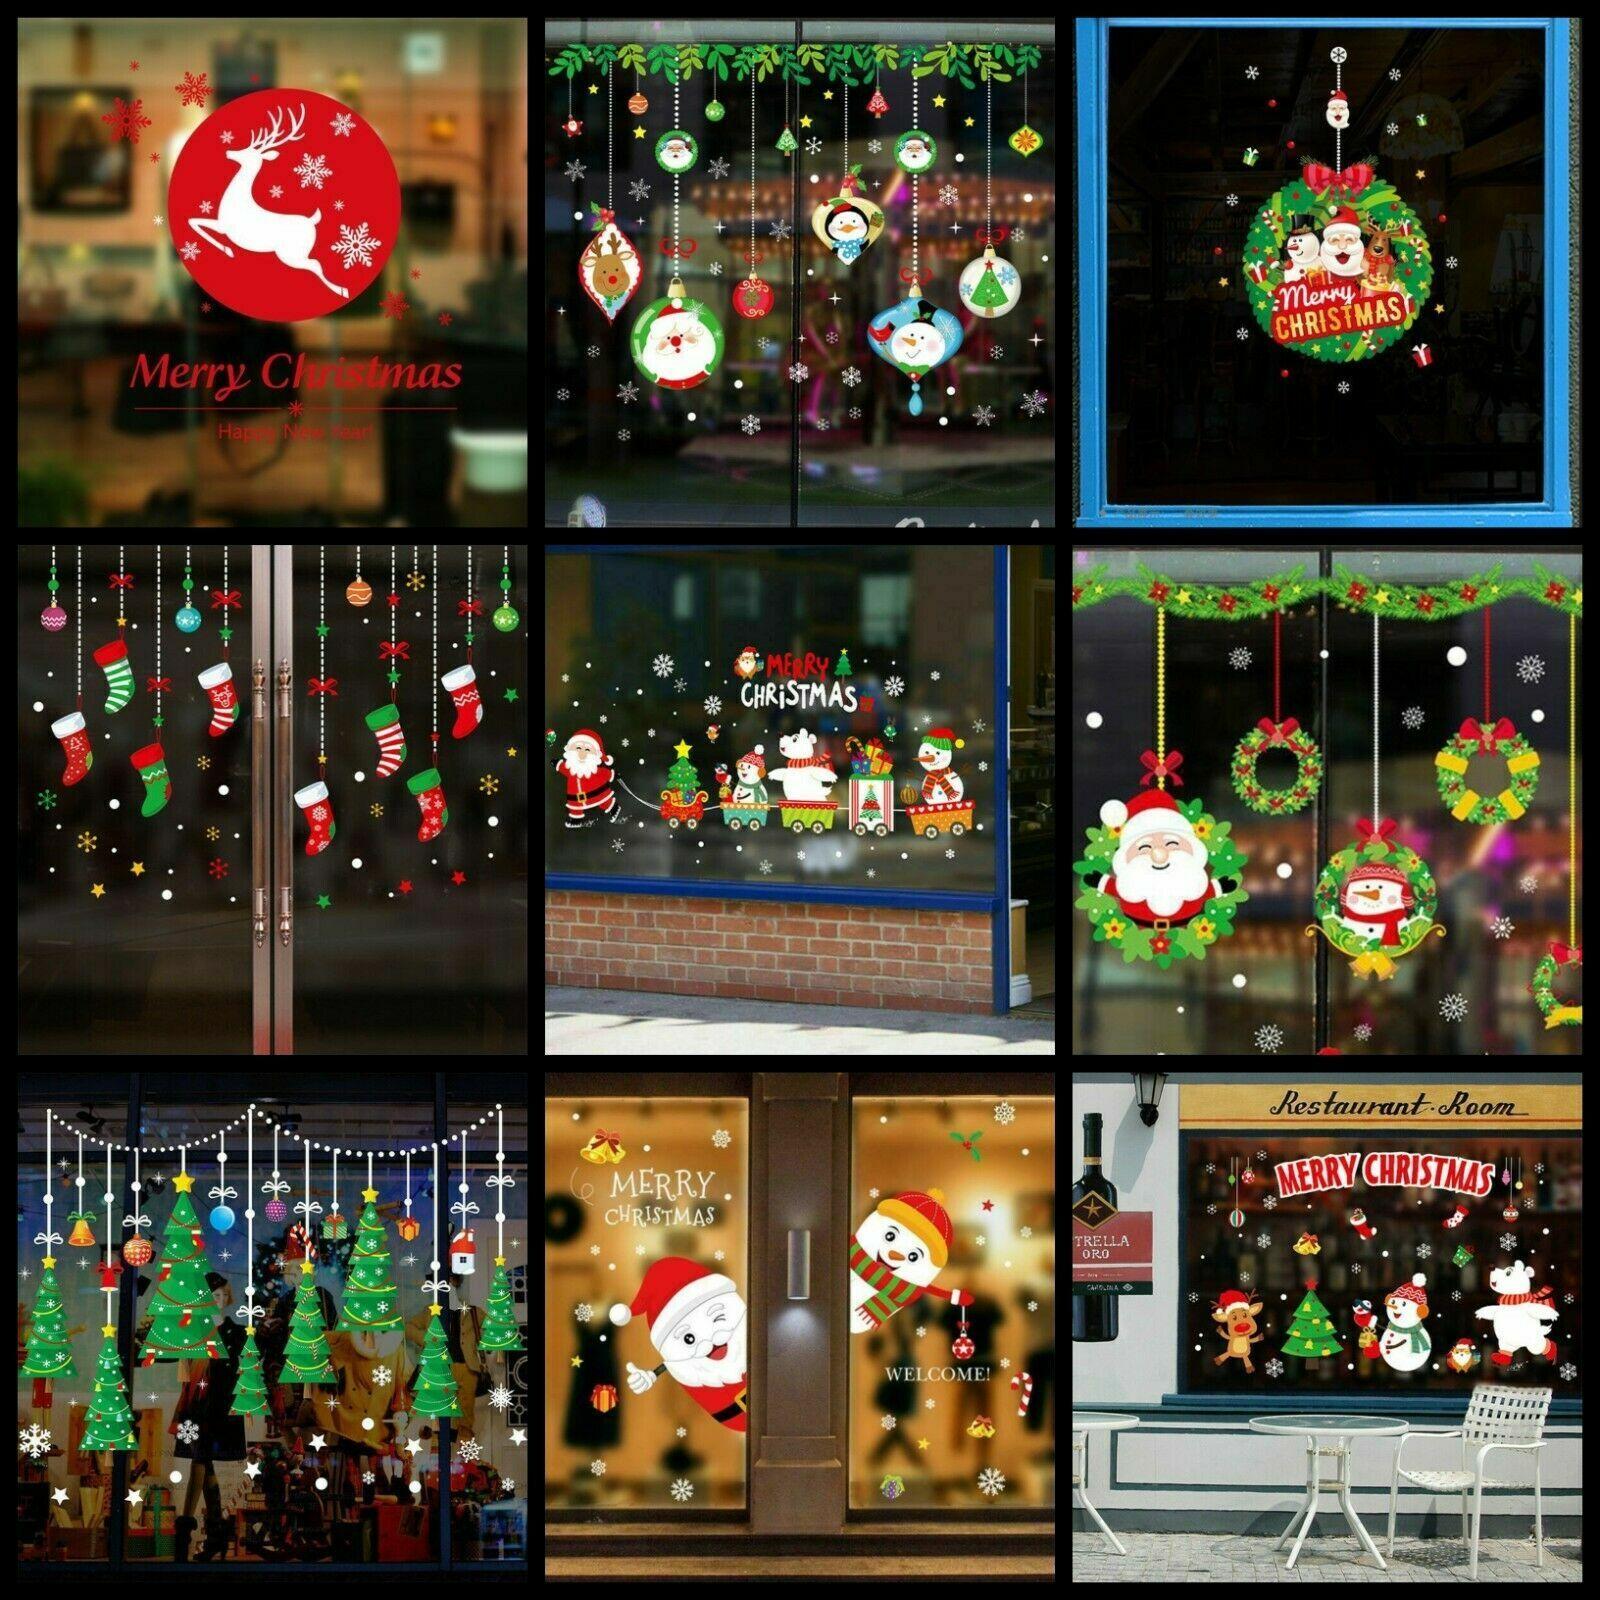 Home Decoration - Christmas Xmas Santa Removable Window Stickers Art Decal Home Shop Decor UK